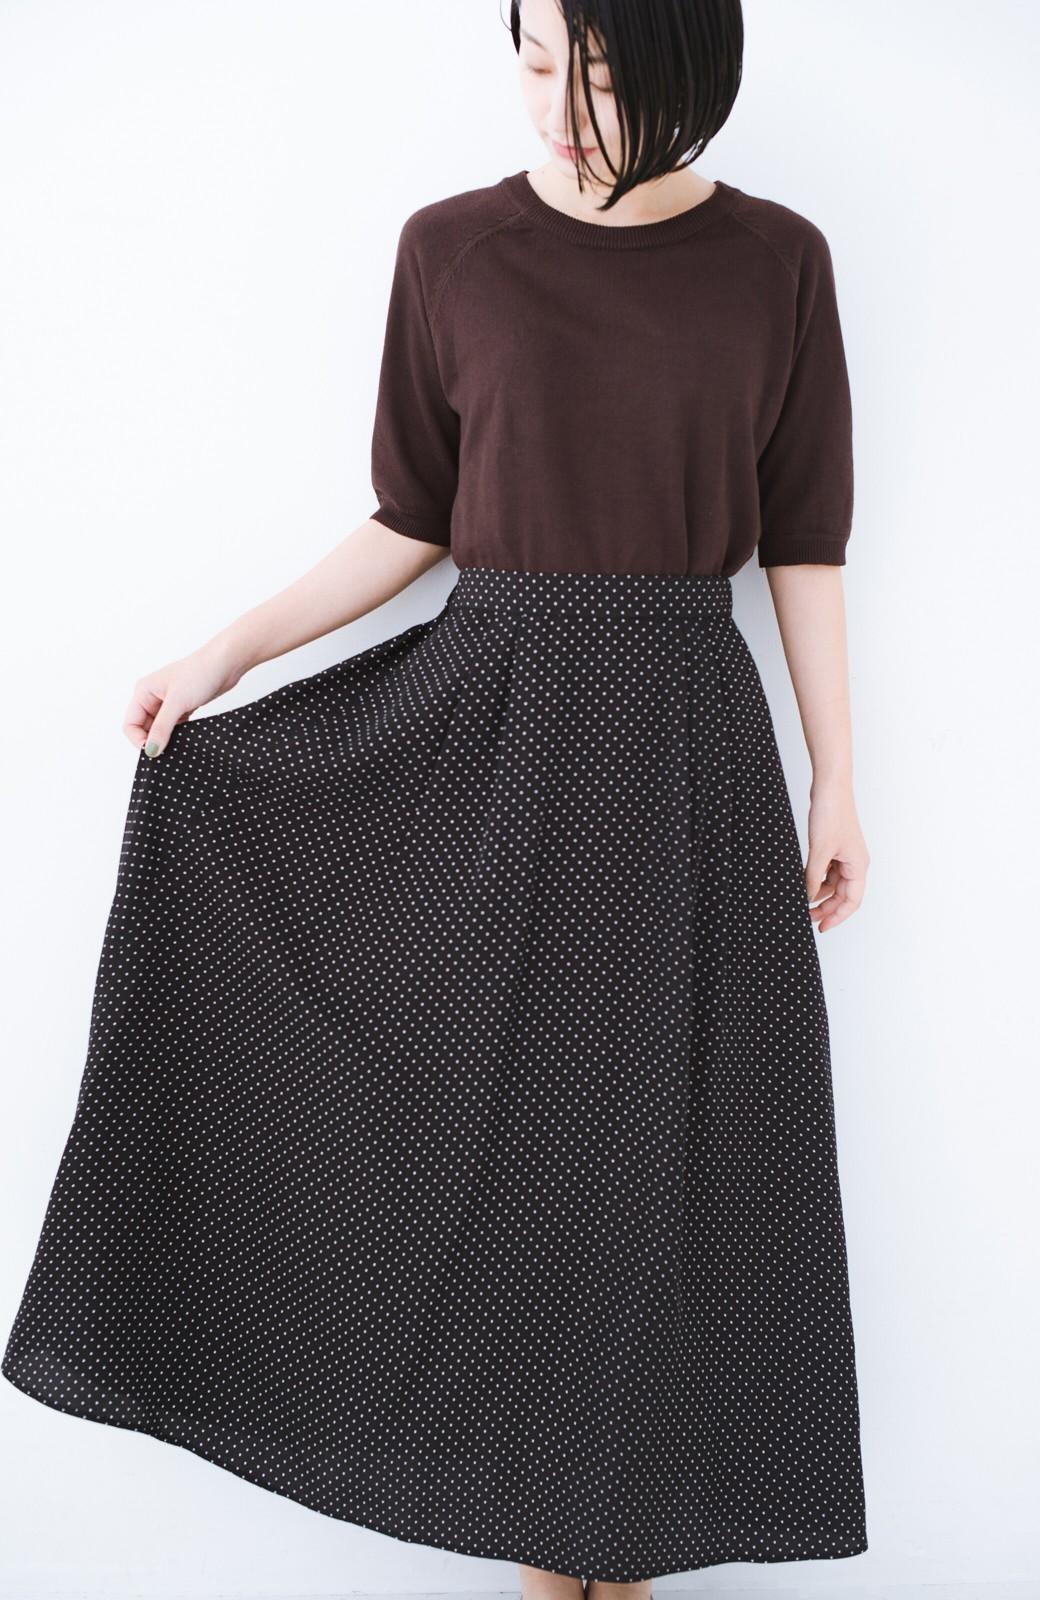 haco! ずっと着られる大人のドットロングスカート by que made me <ブラック系その他>の商品写真11